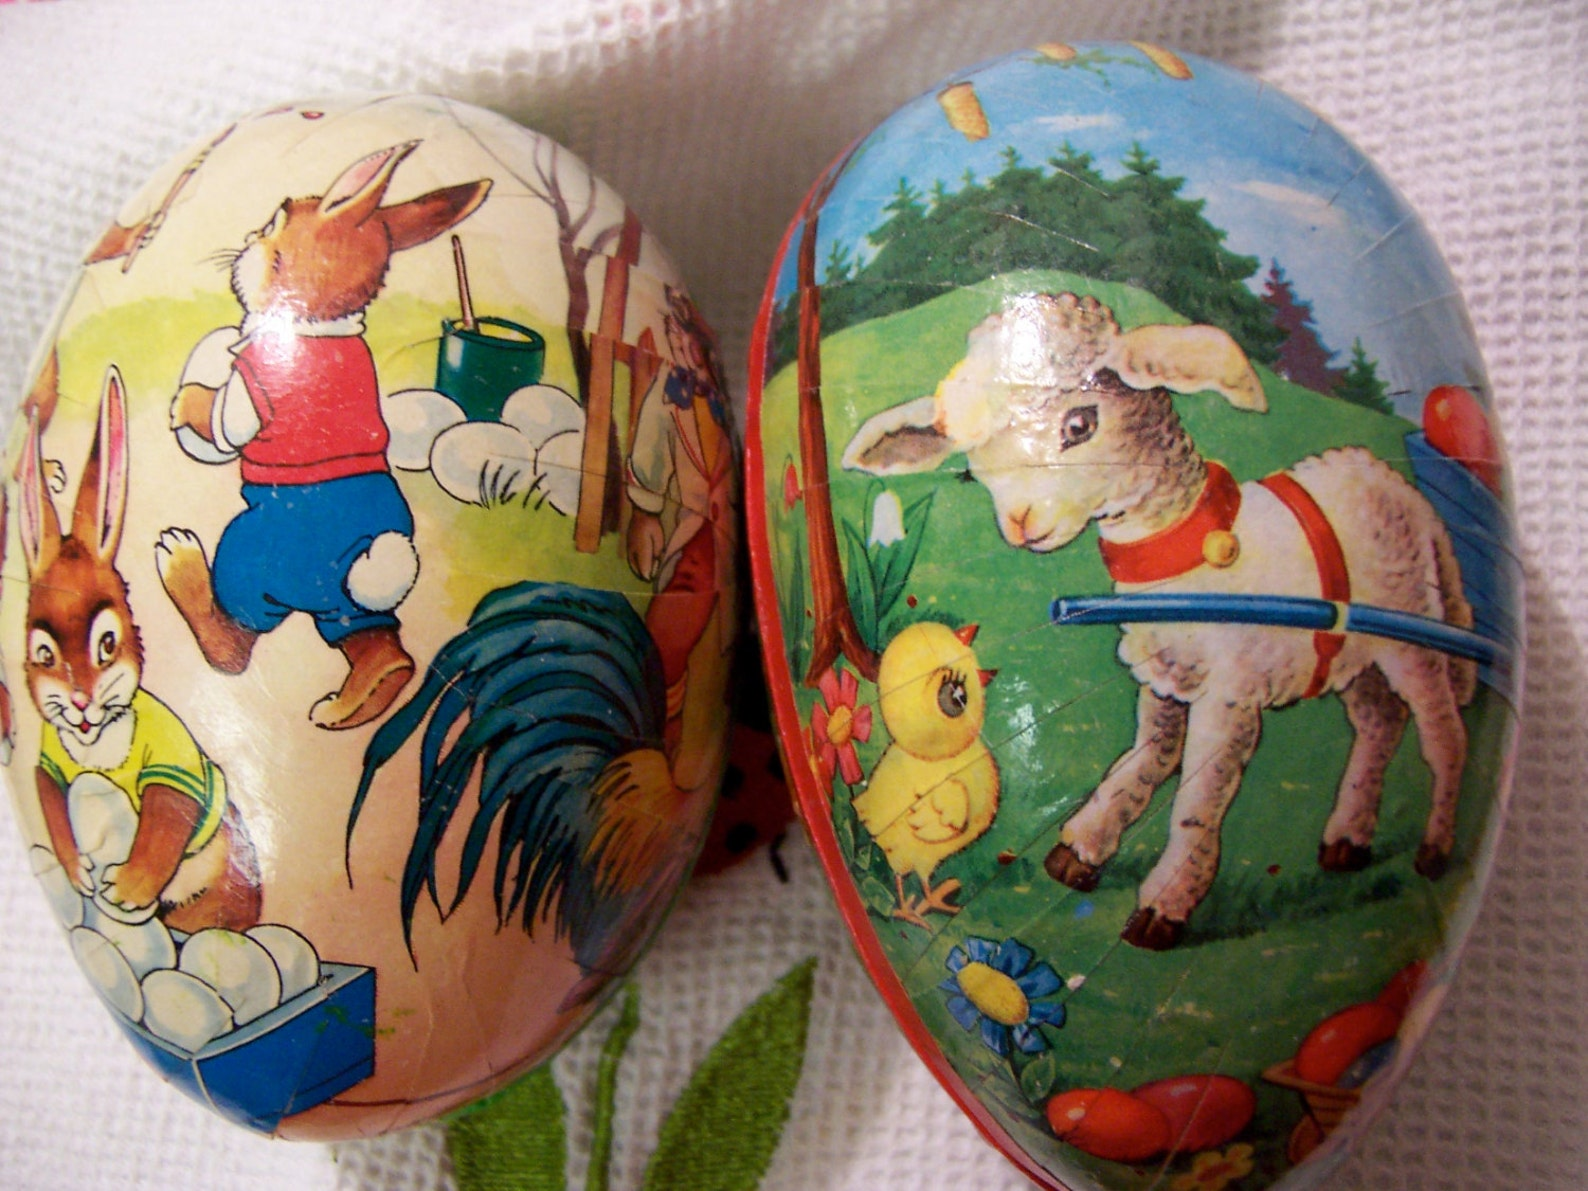 eggs / paper mache collectable eggs